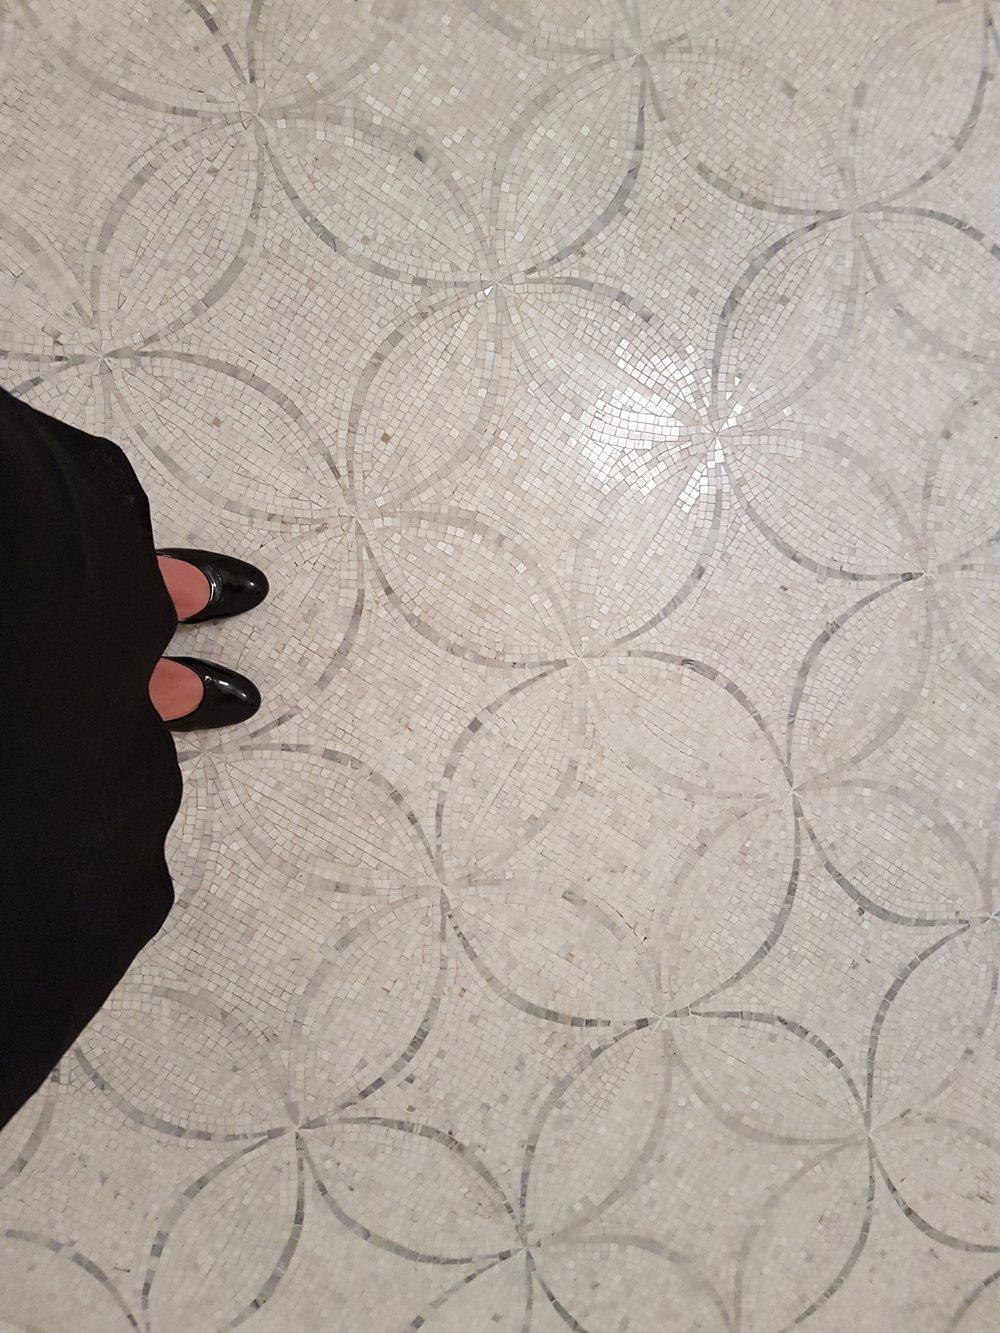 Tile floor in pool cabana.